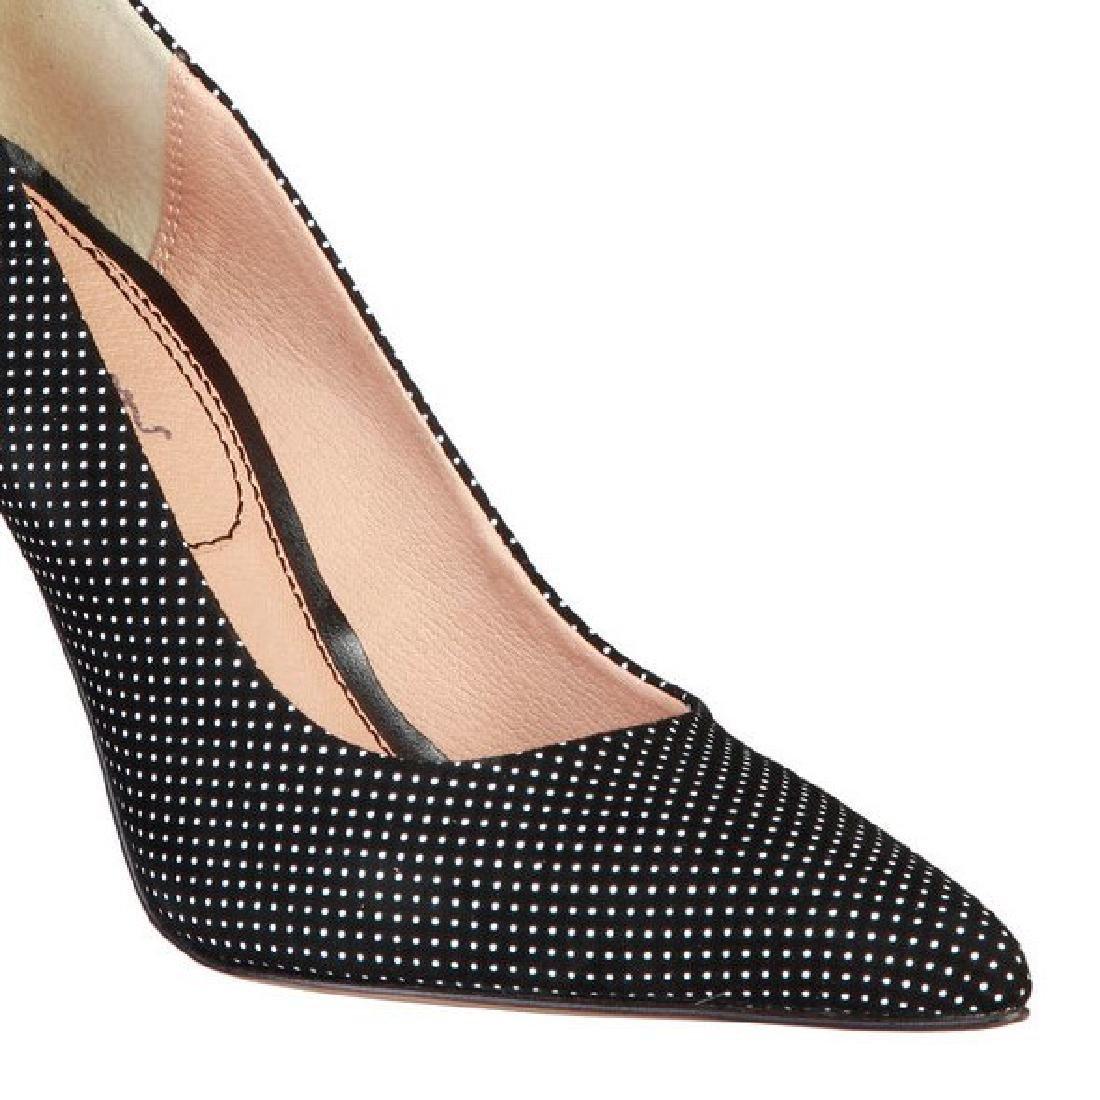 New Women's Pierre Cardin High Heel Pumps Shoes US 8.5 - 2